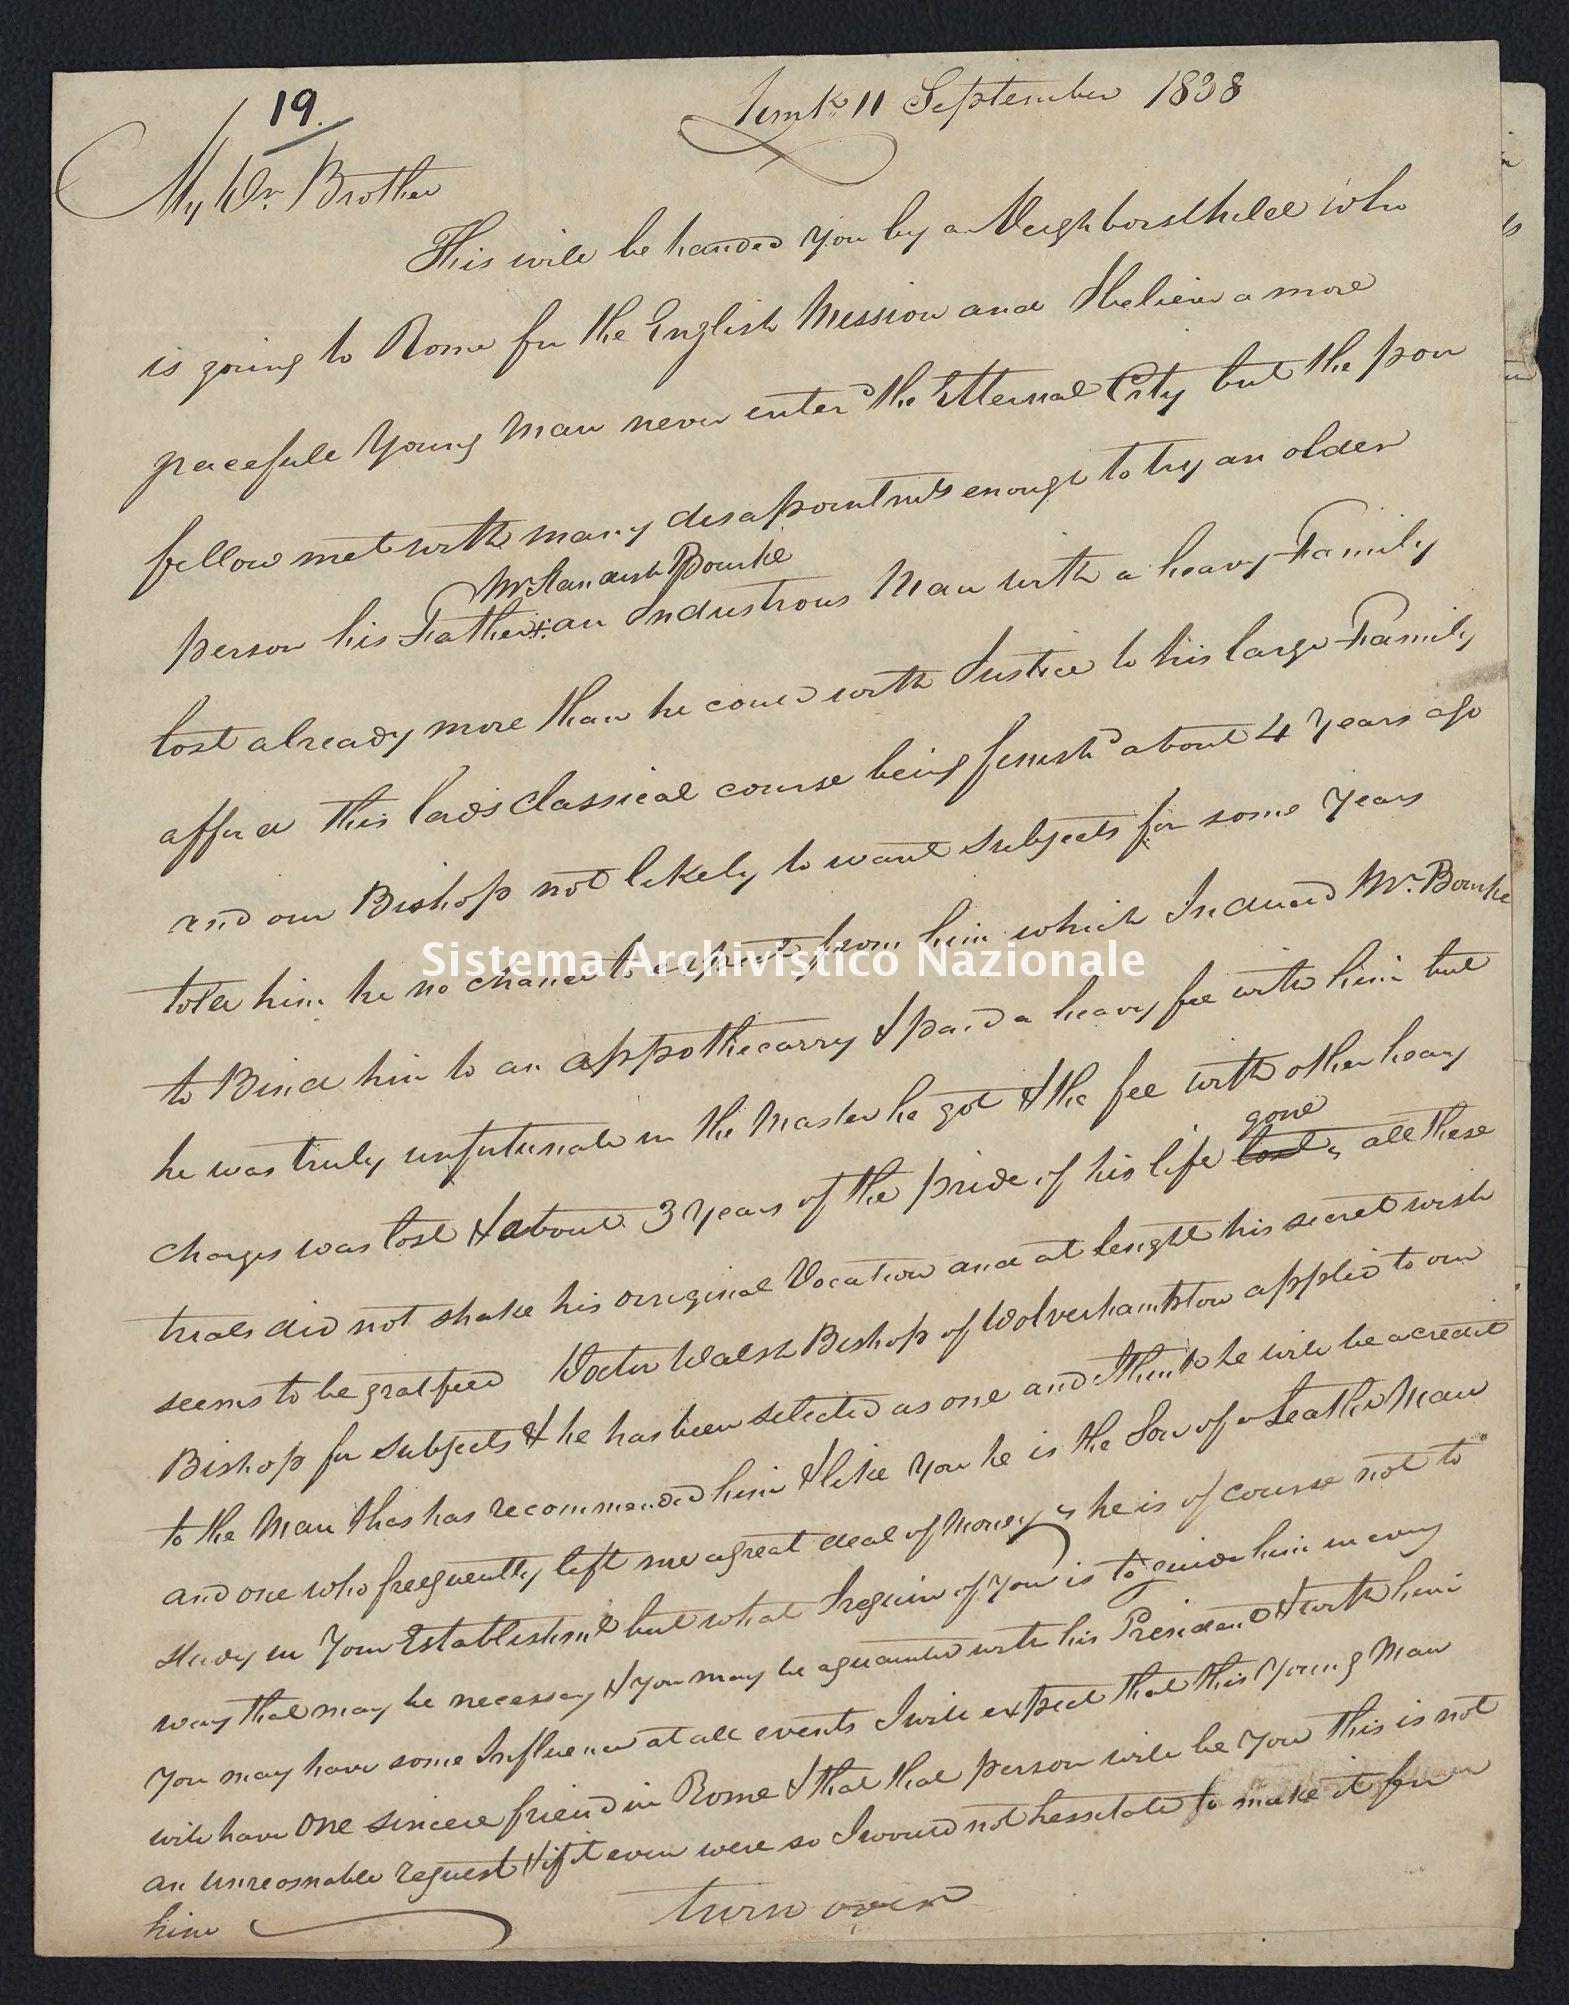 Pontificio Collegio Irlandese - Kirby_1838_19